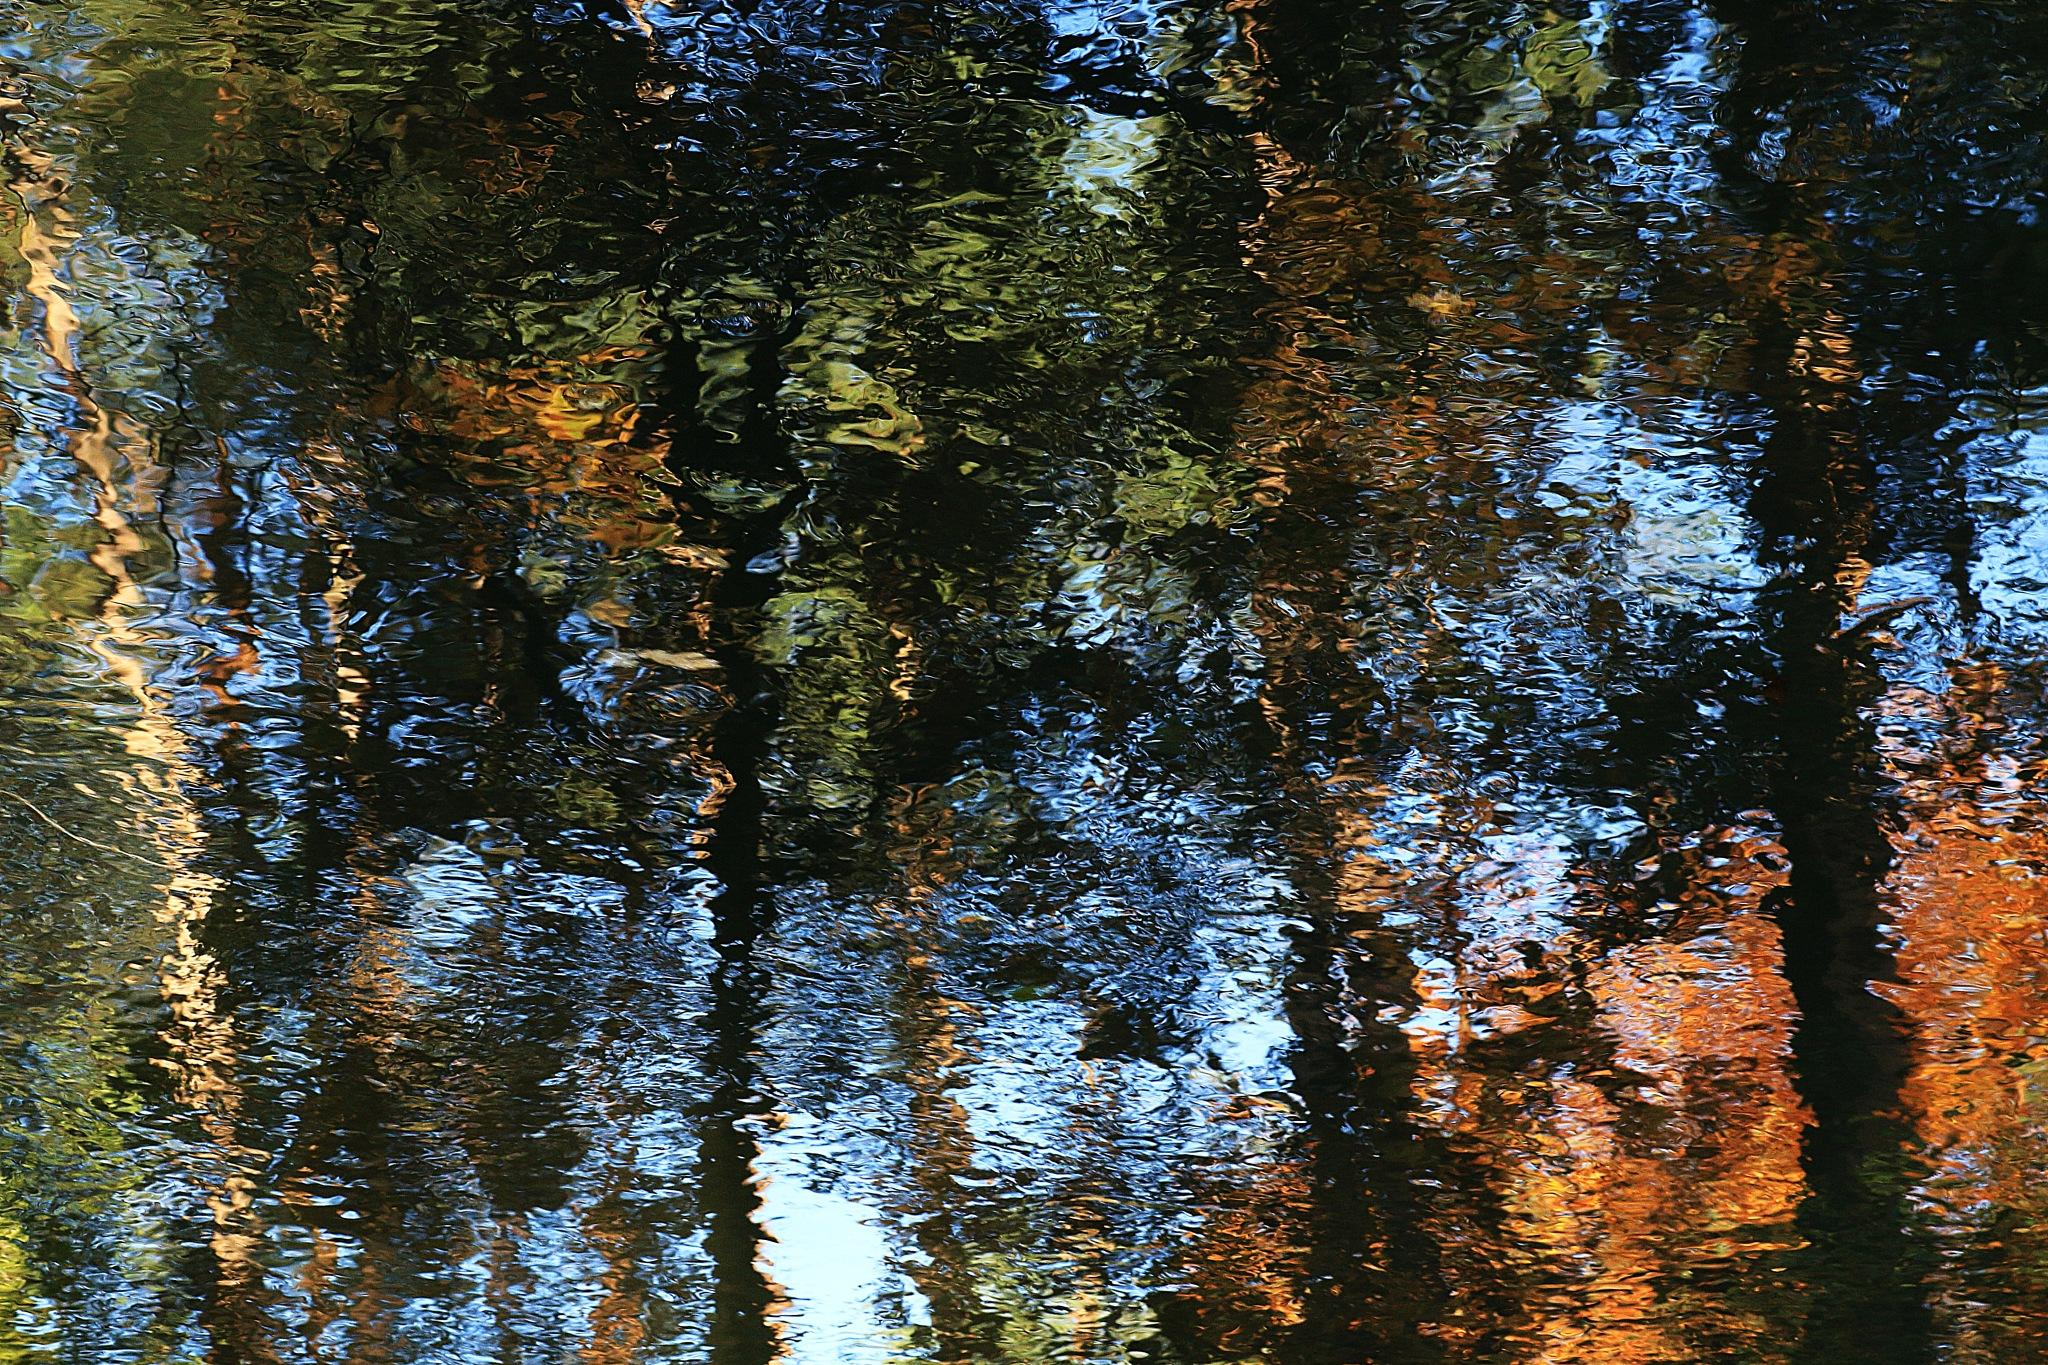 Autumn forest by JAKOKTO PAUKAS